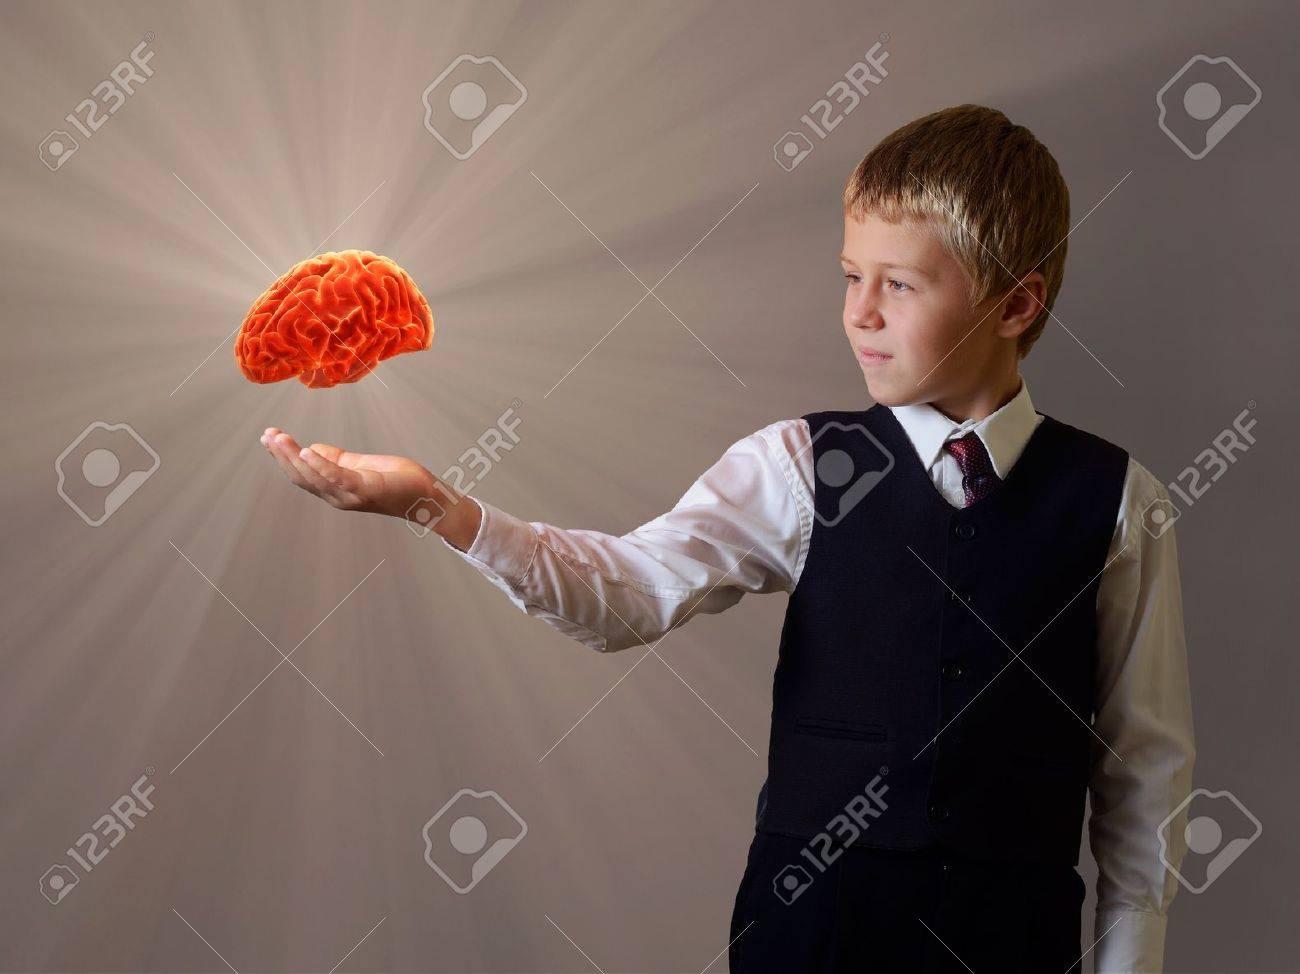 glowing brain of the child hand - 15603772